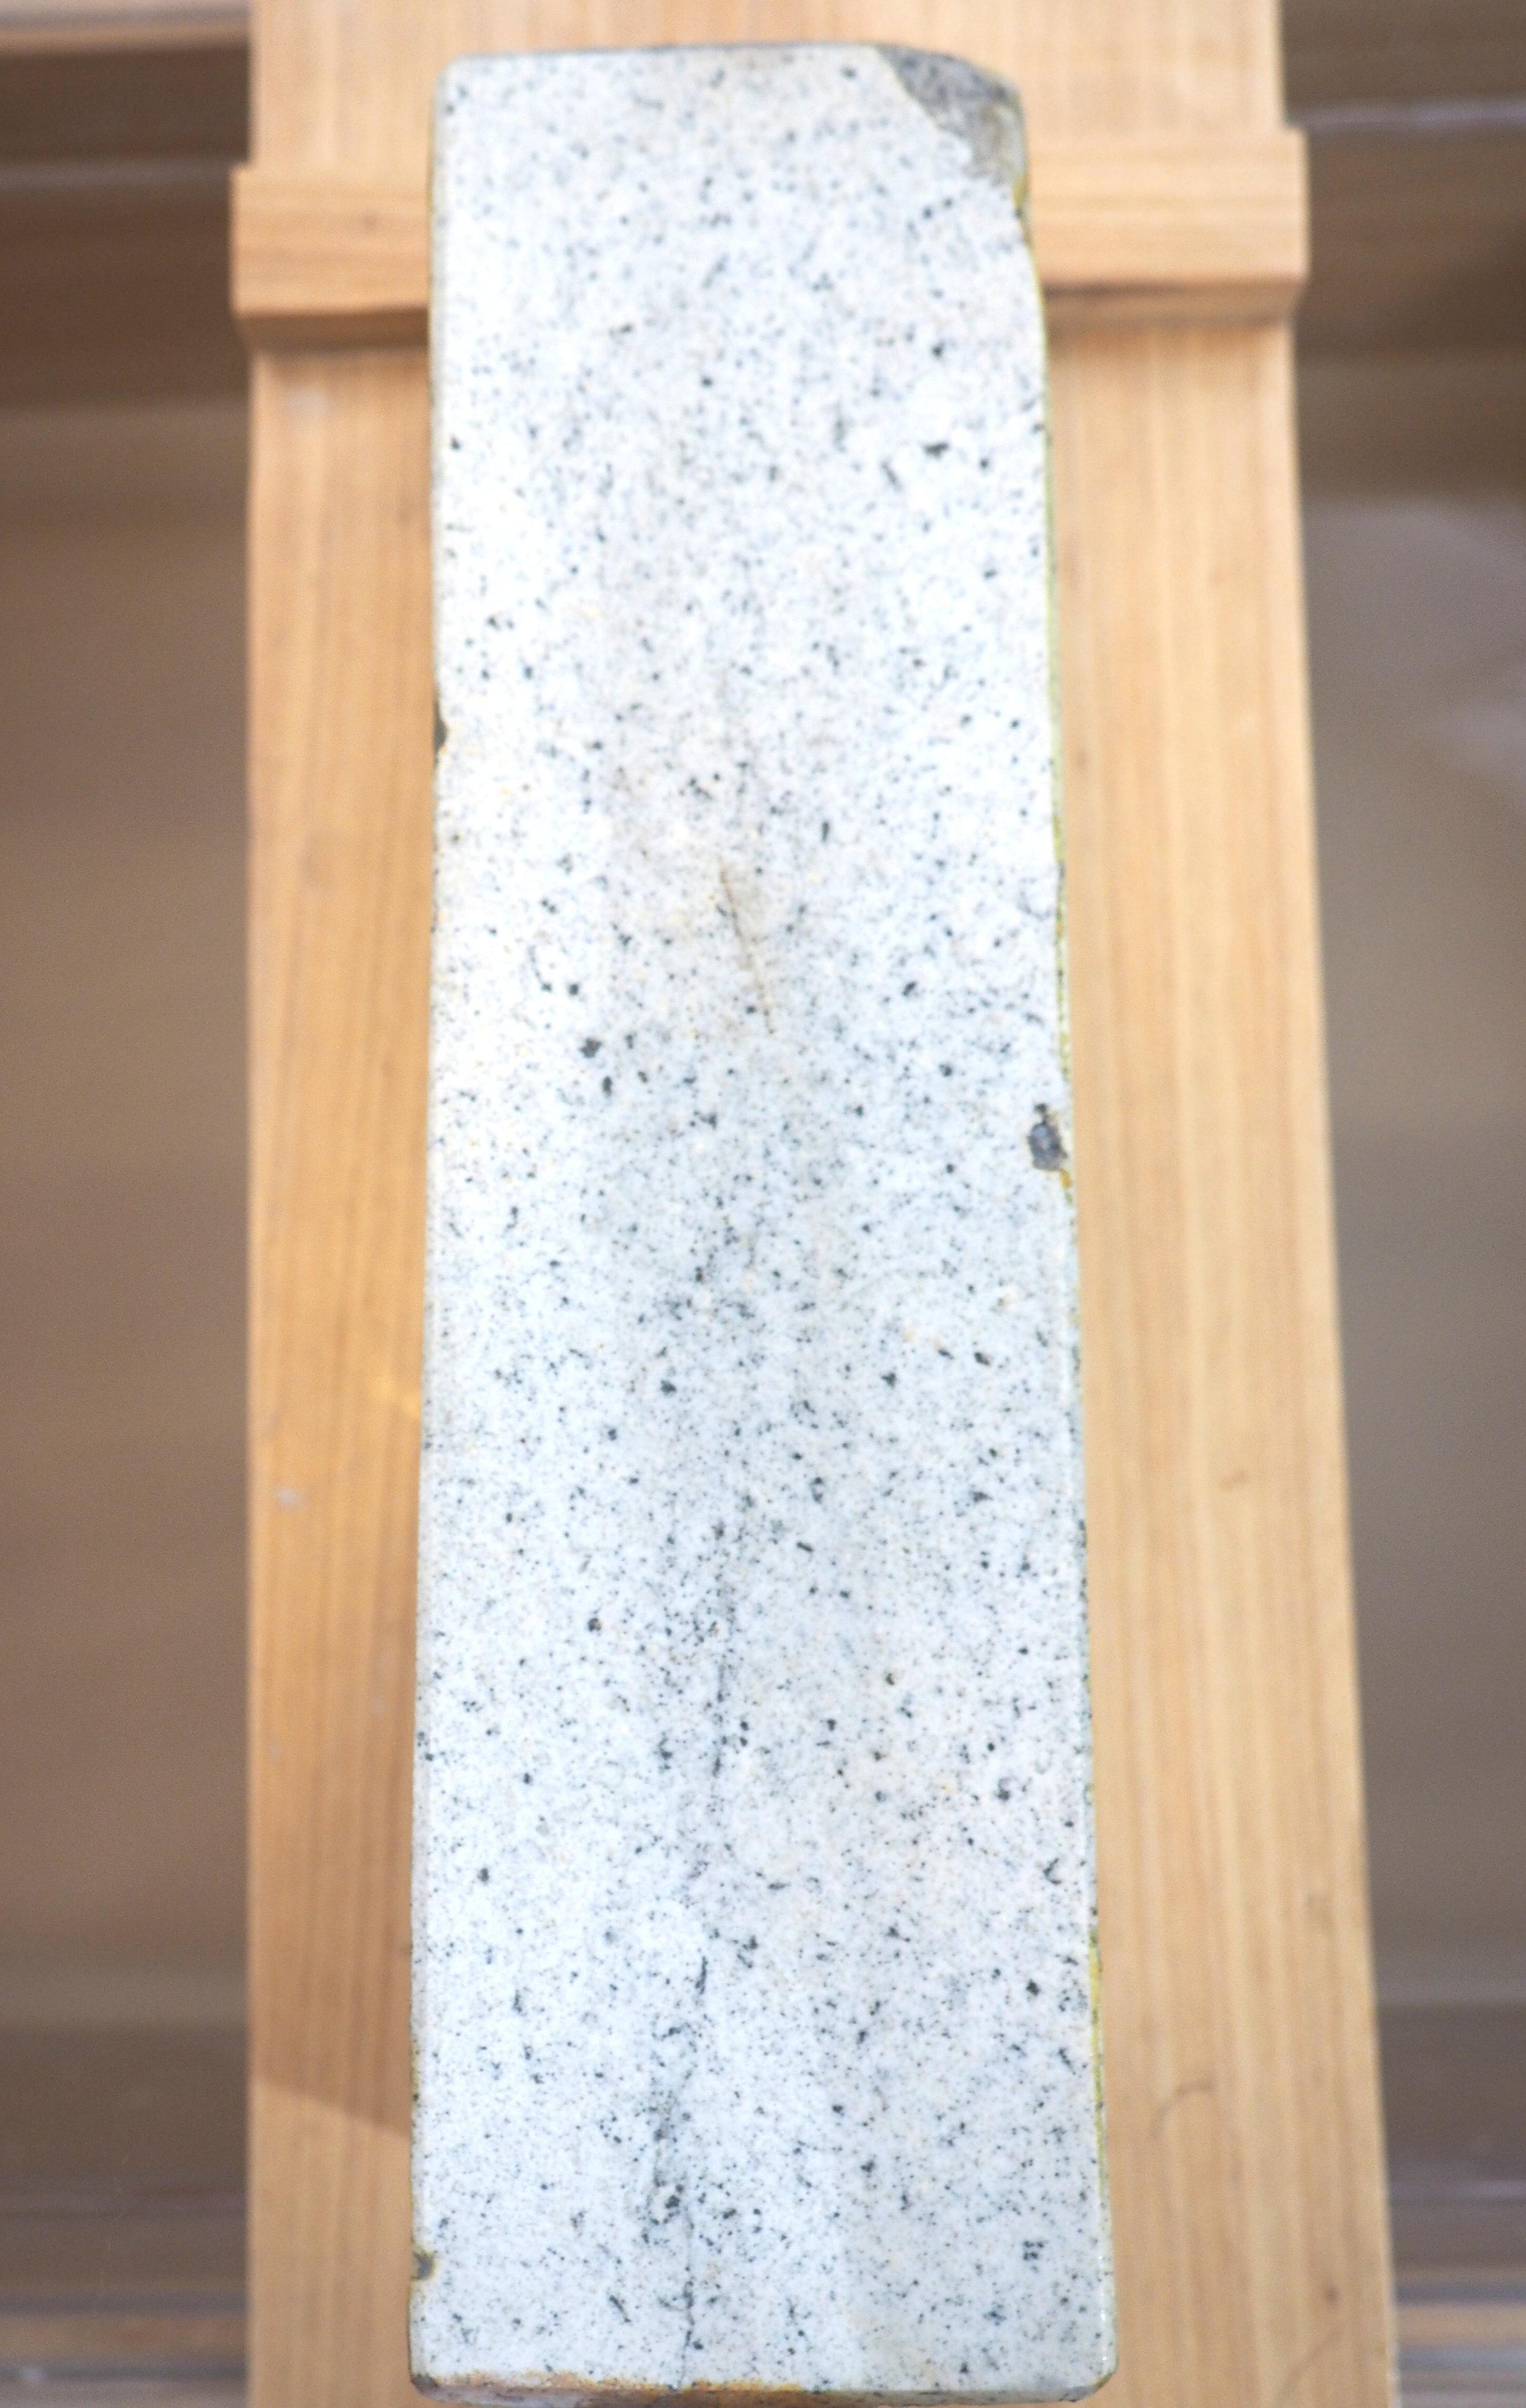 Iyoto front.jpg